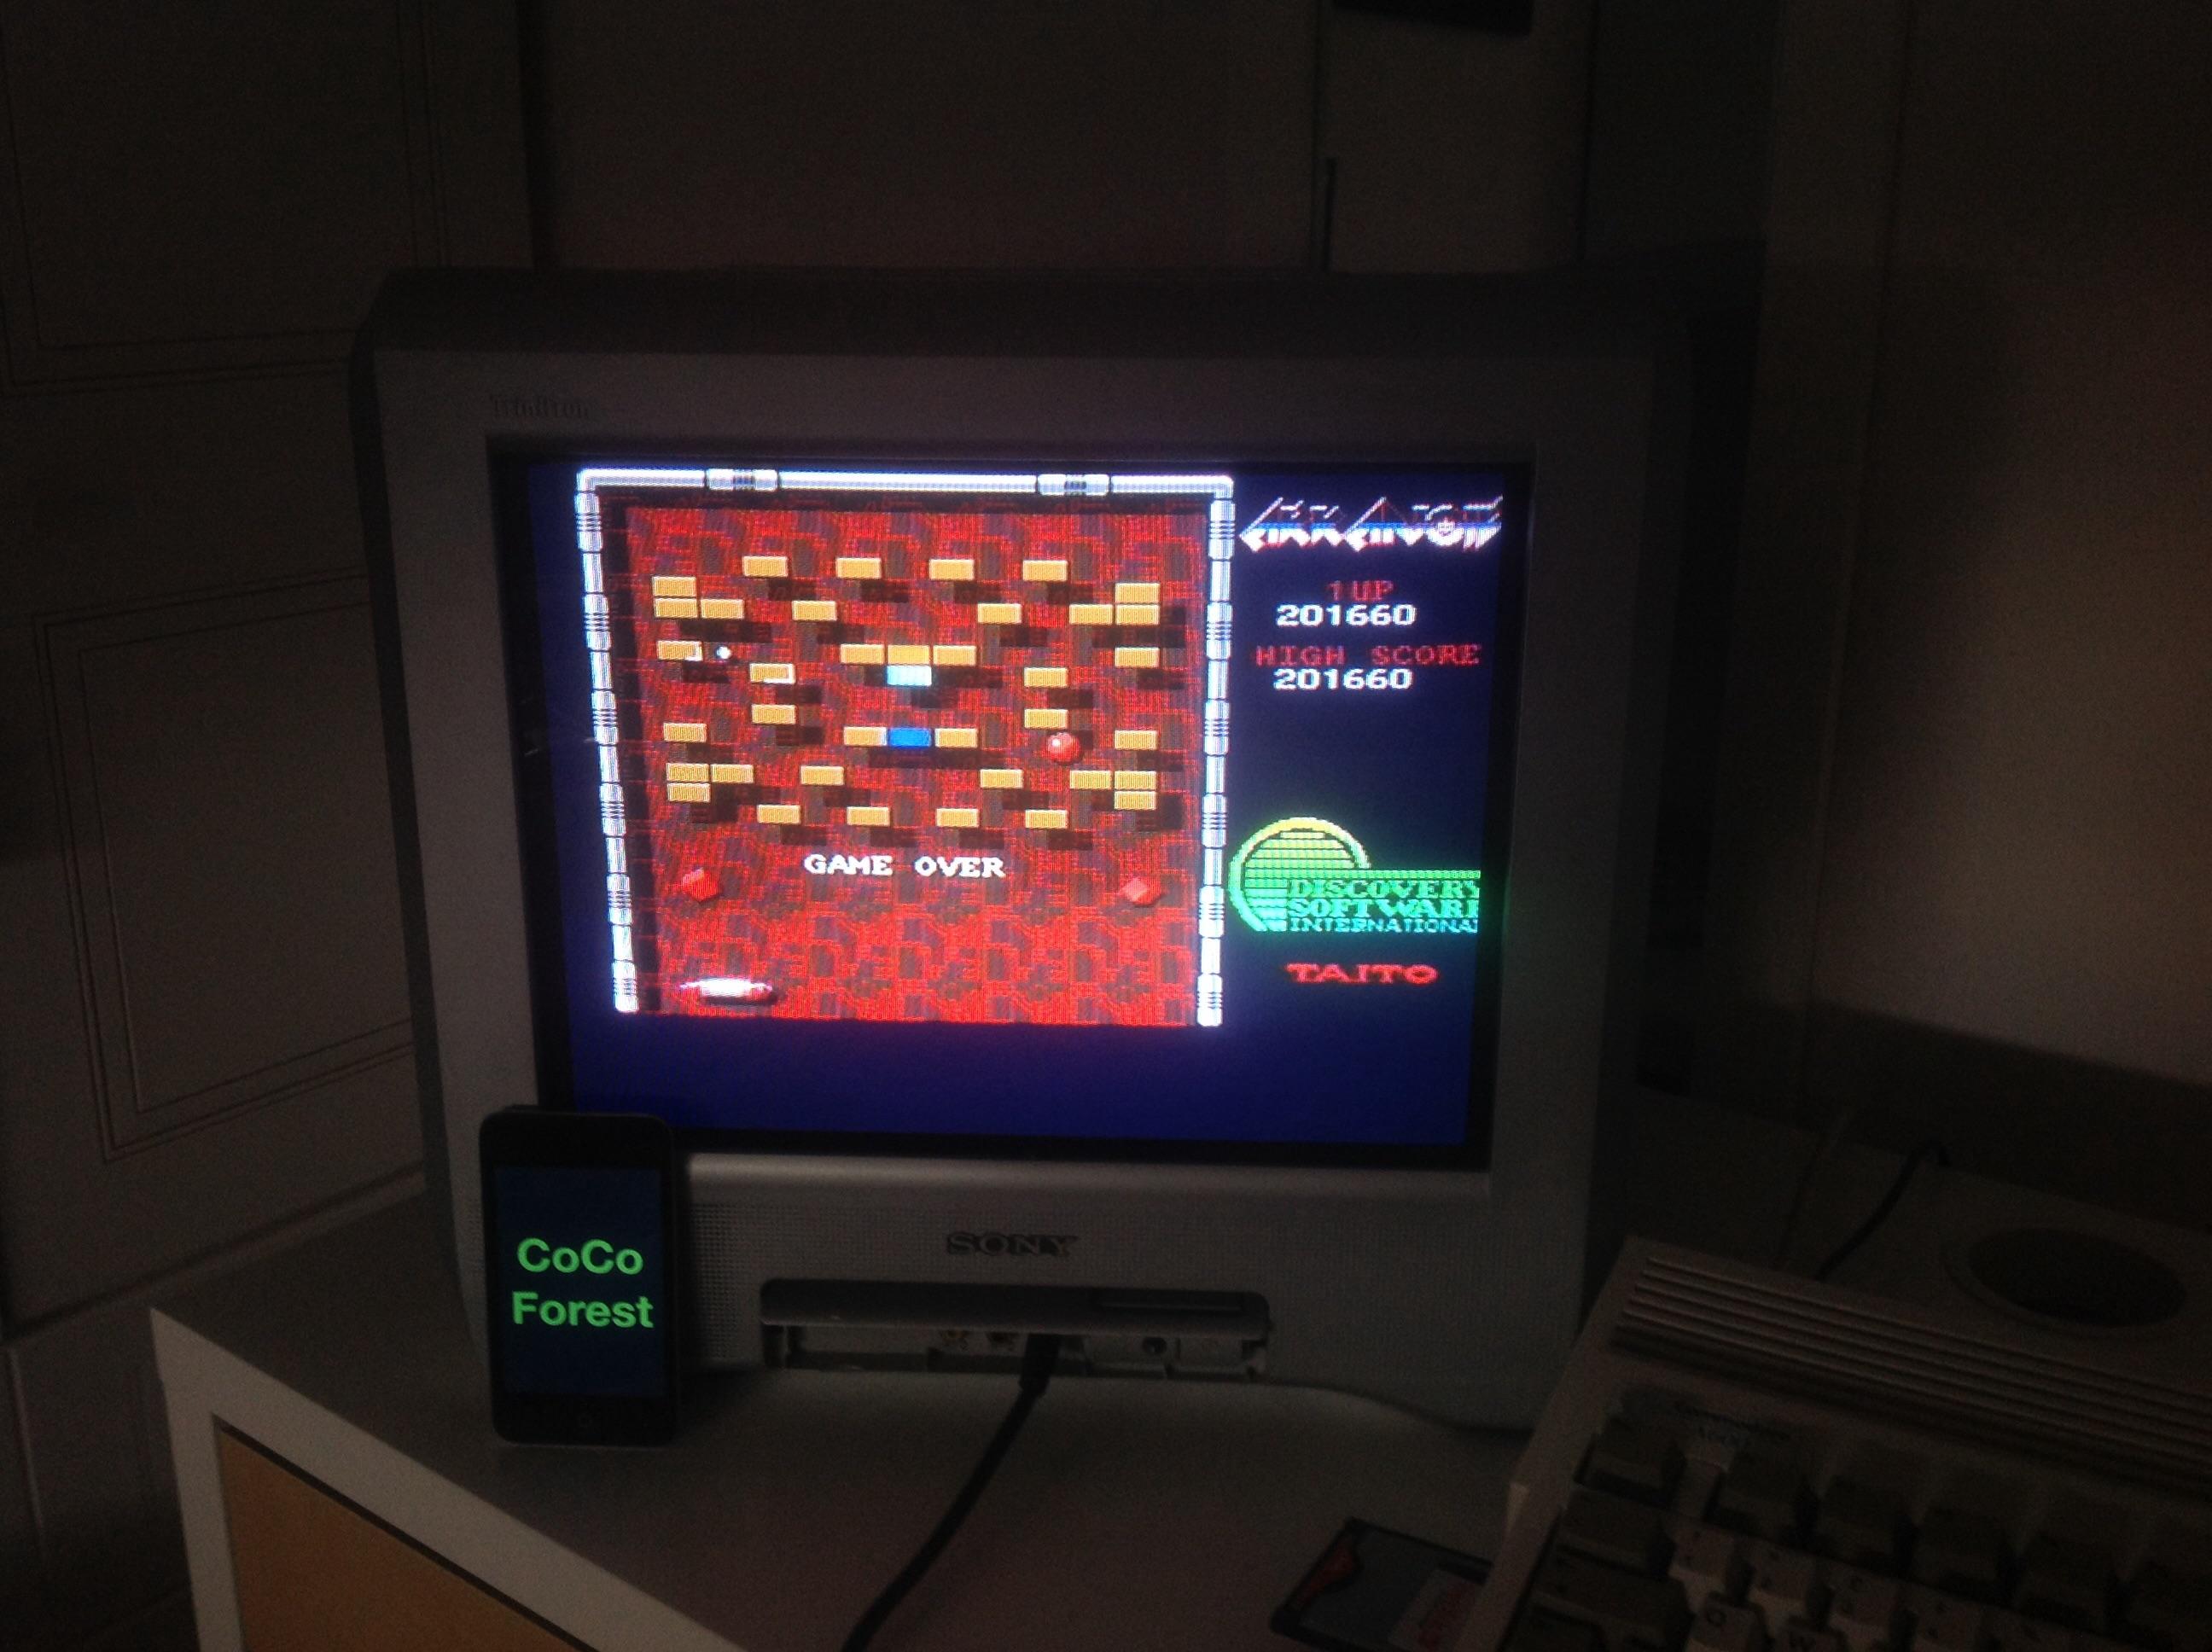 CoCoForest: Arkanoid (Amiga) 201,660 points on 2014-10-11 09:39:49